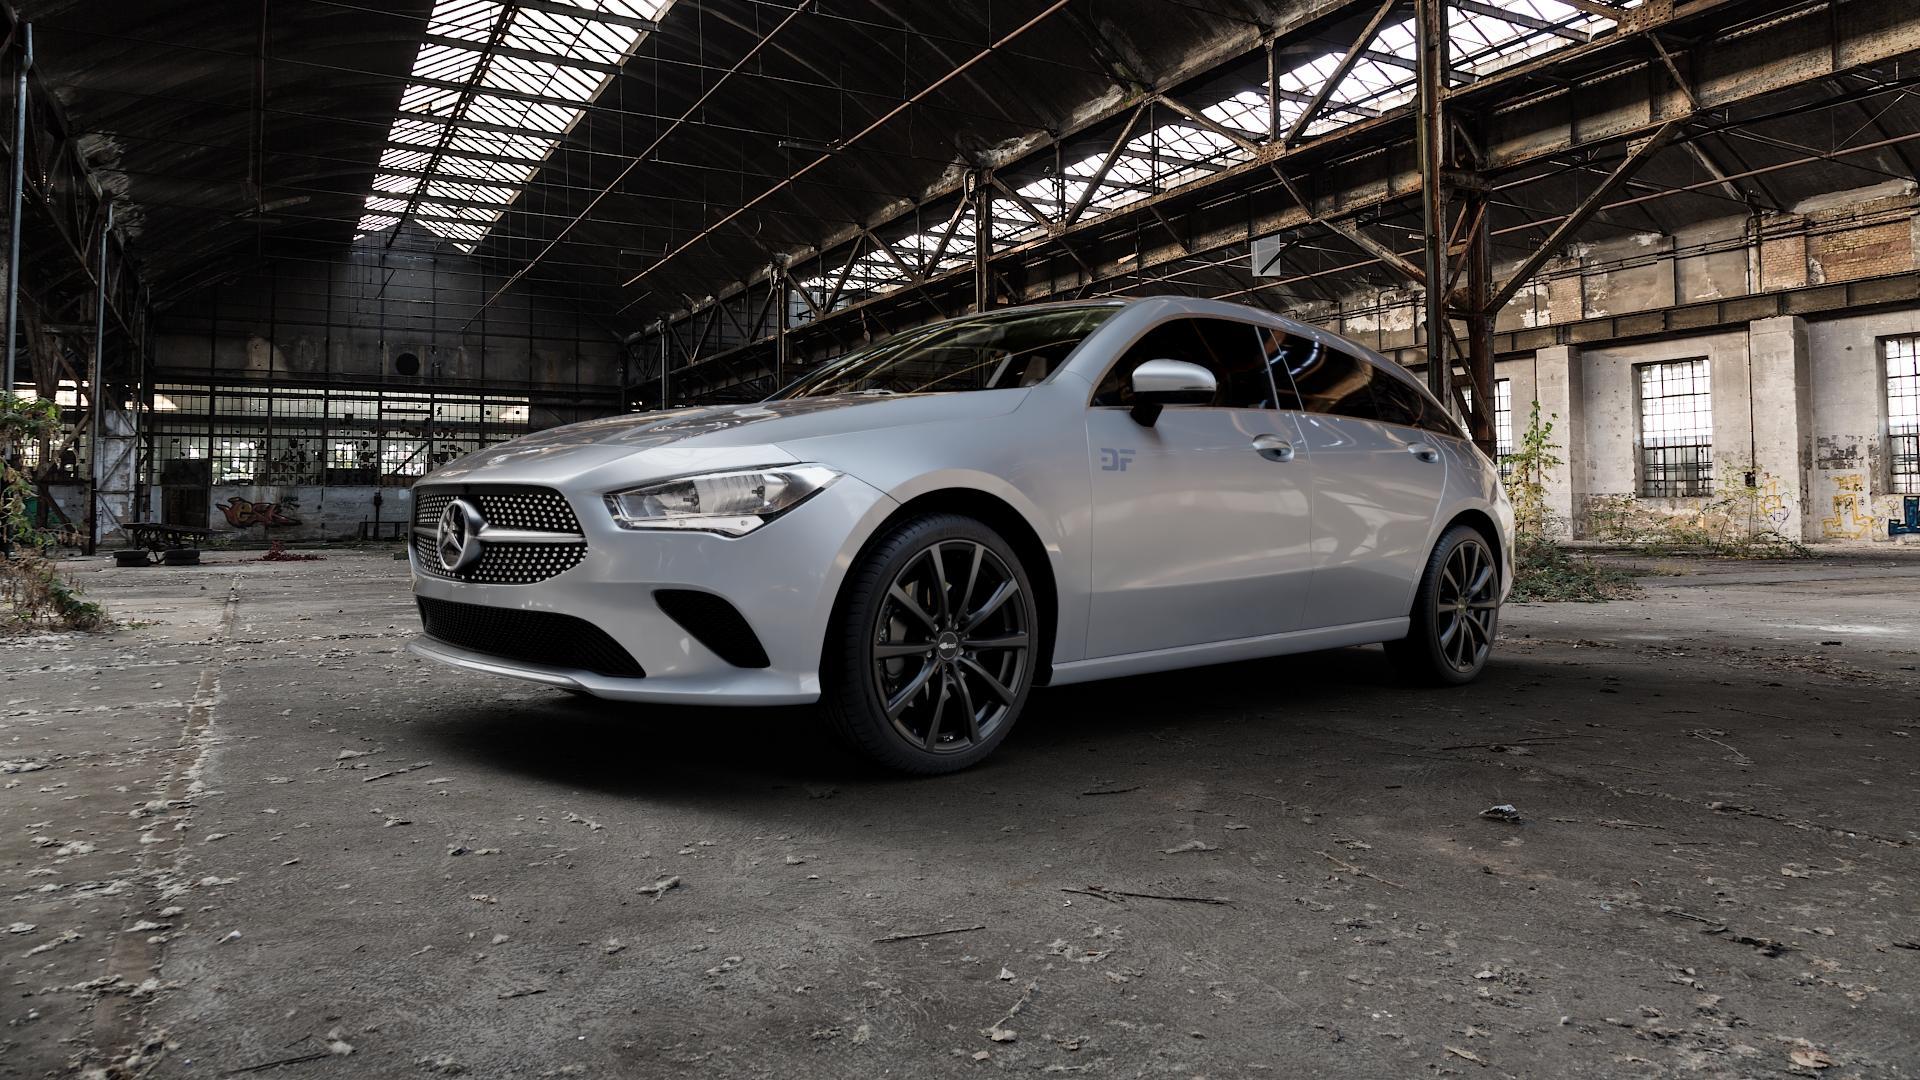 Mercedes Cla Klasse Ii Shooting Brake C118 F2cla 2 0l Cla 35 Amg 4matic 225kw 306ps Felgen Und Komplettrader Felgenshop De